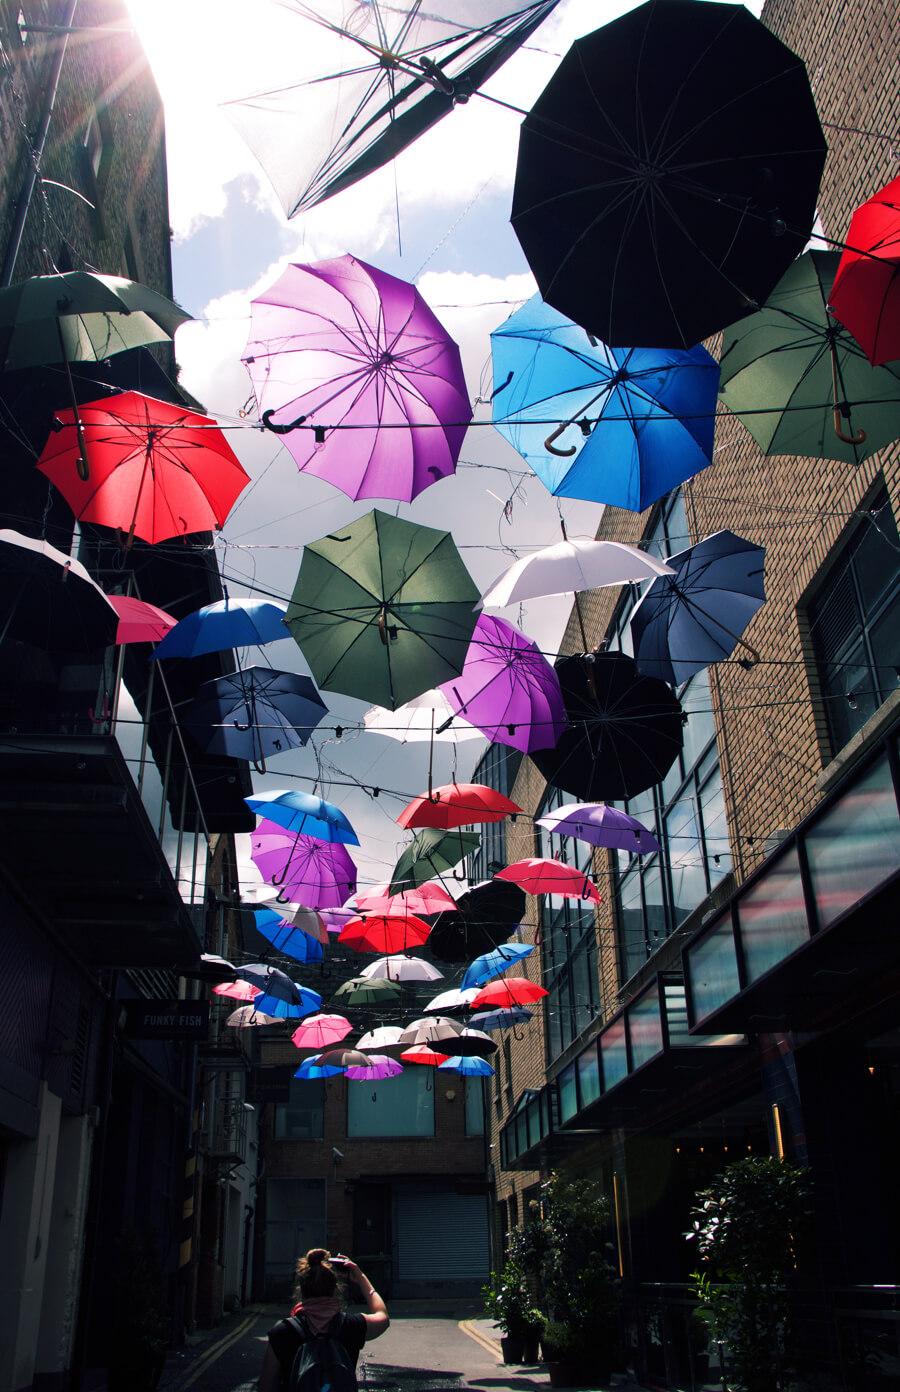 Dublin umbrellas